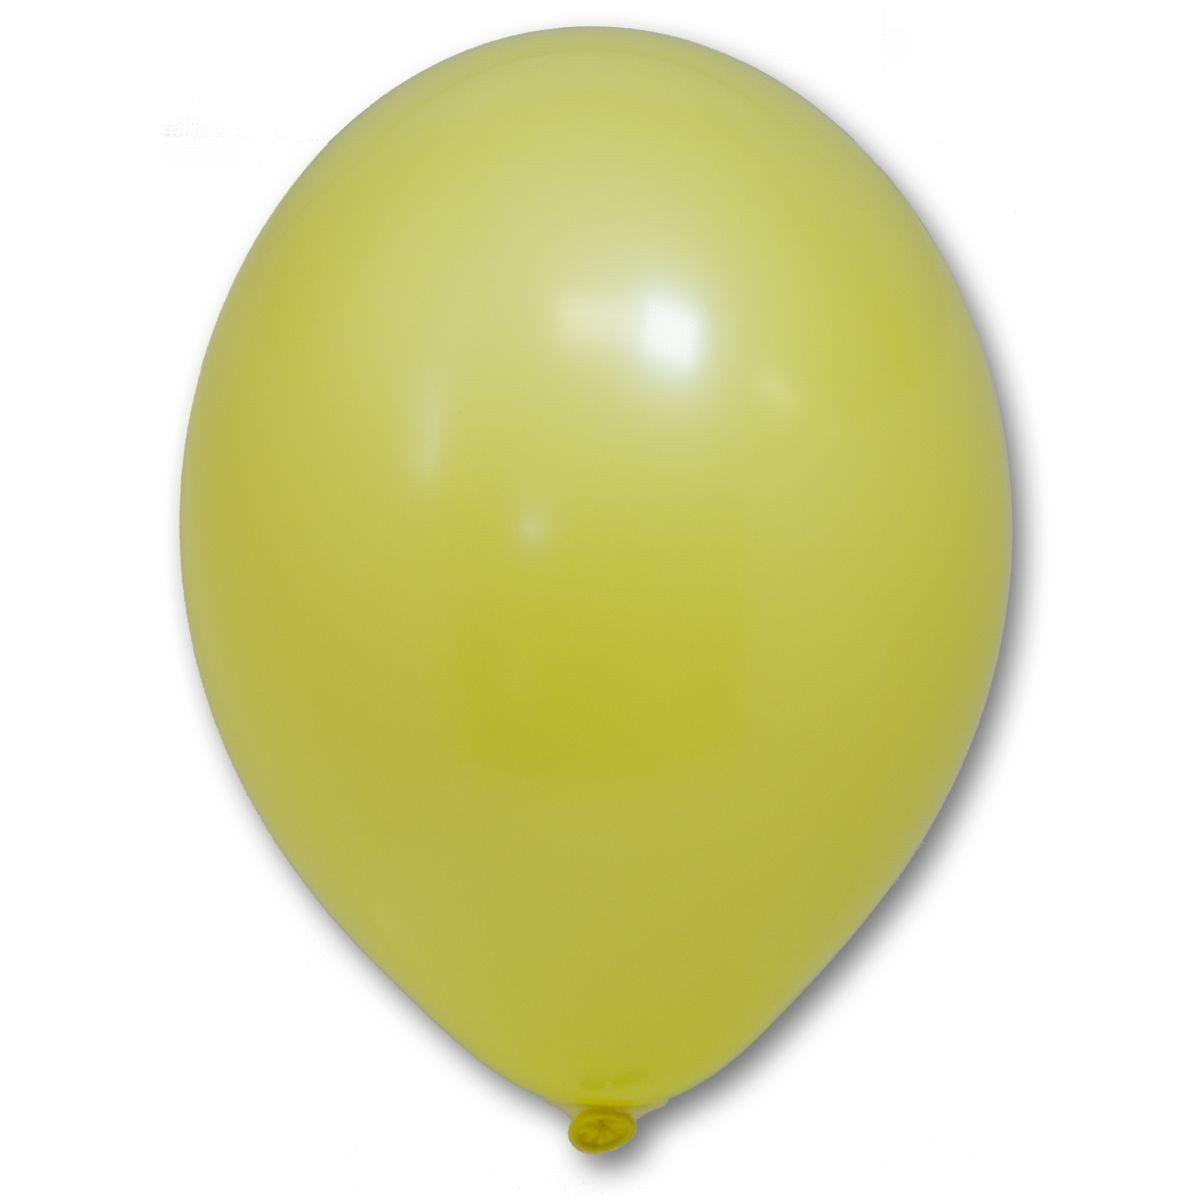 "Латексна кулька жовта пастель B85/006/ 10"" Belbal"